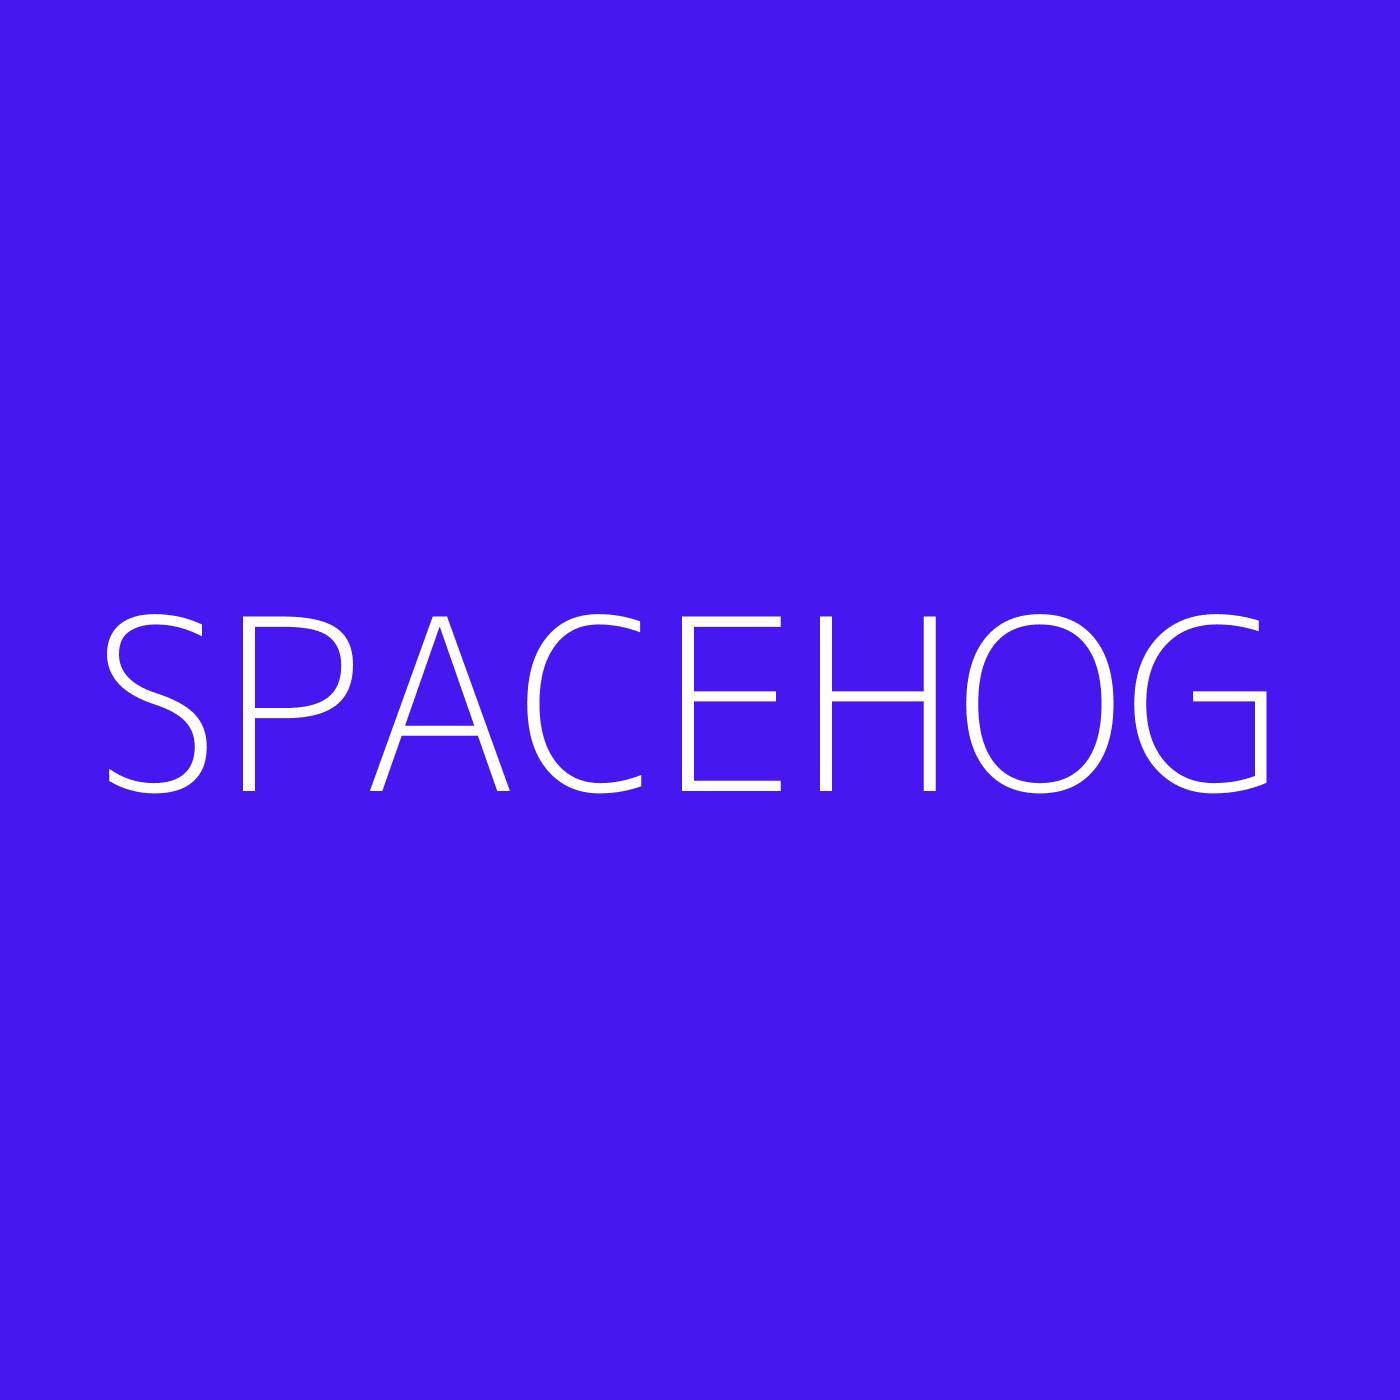 Spacehog Playlist Artwork